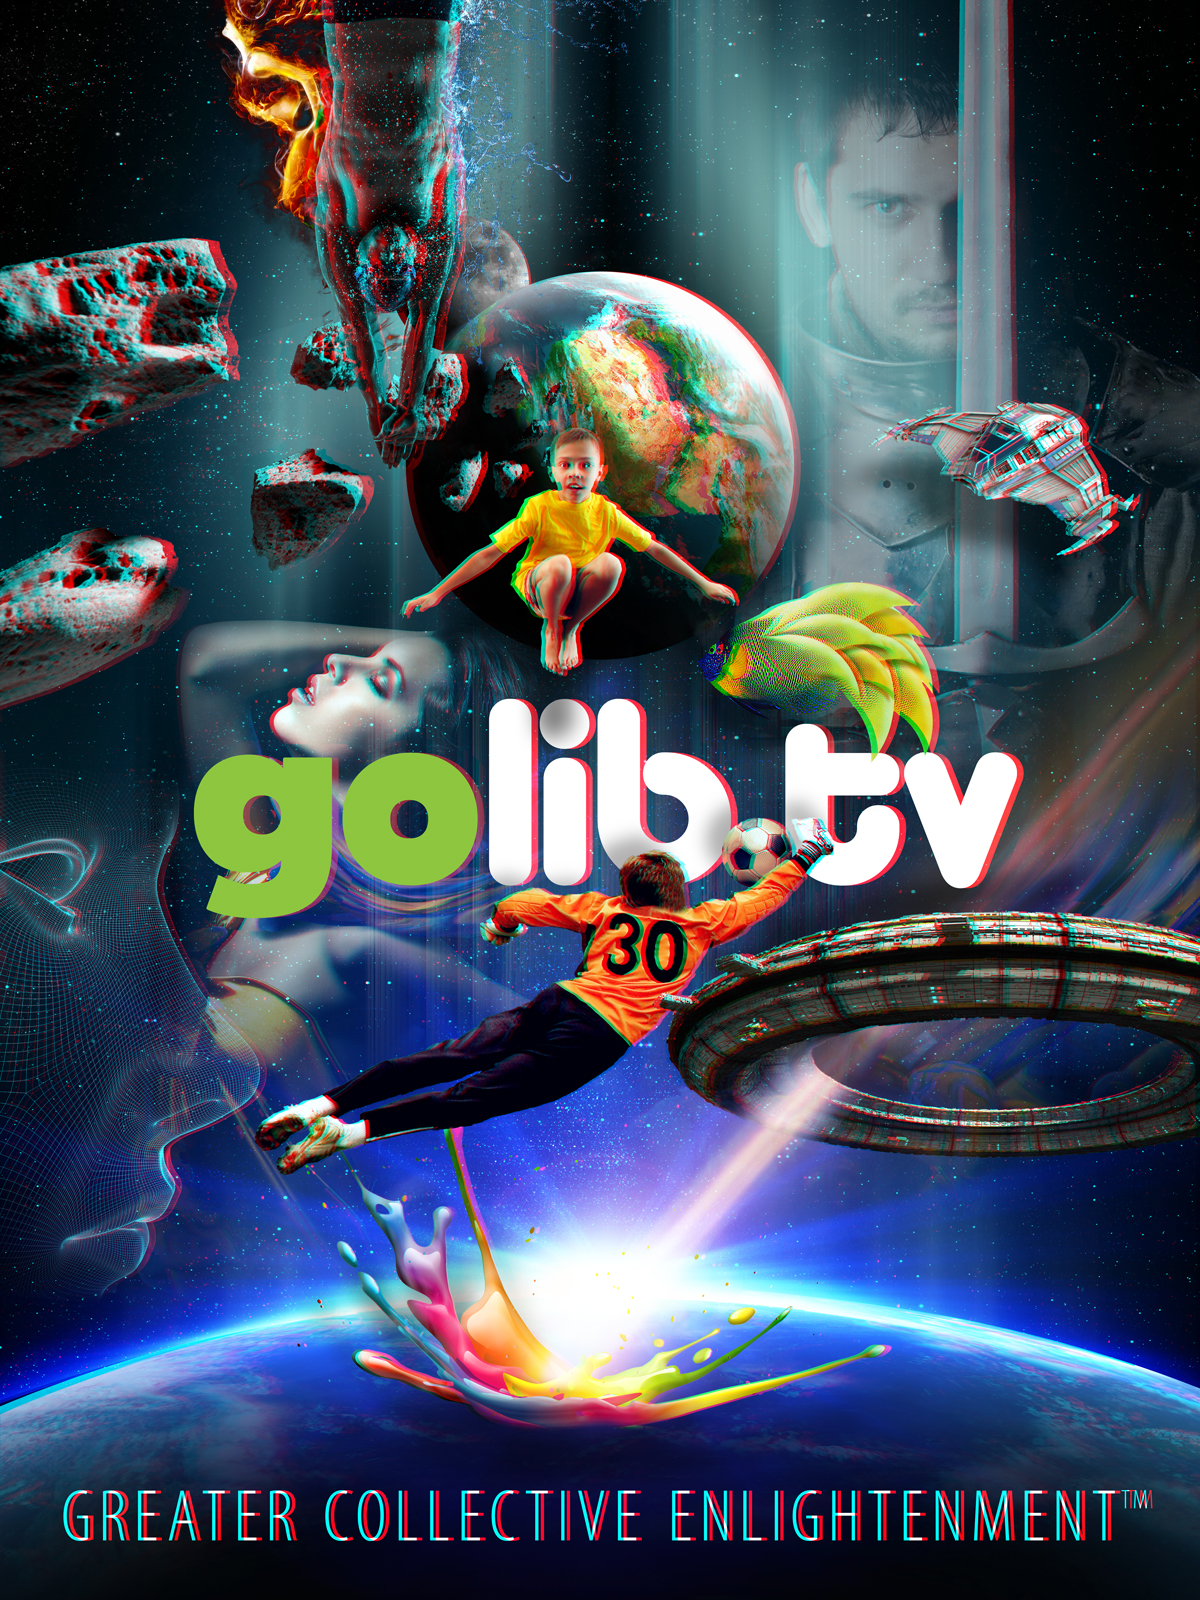 GoLibe.tv 3D Poster